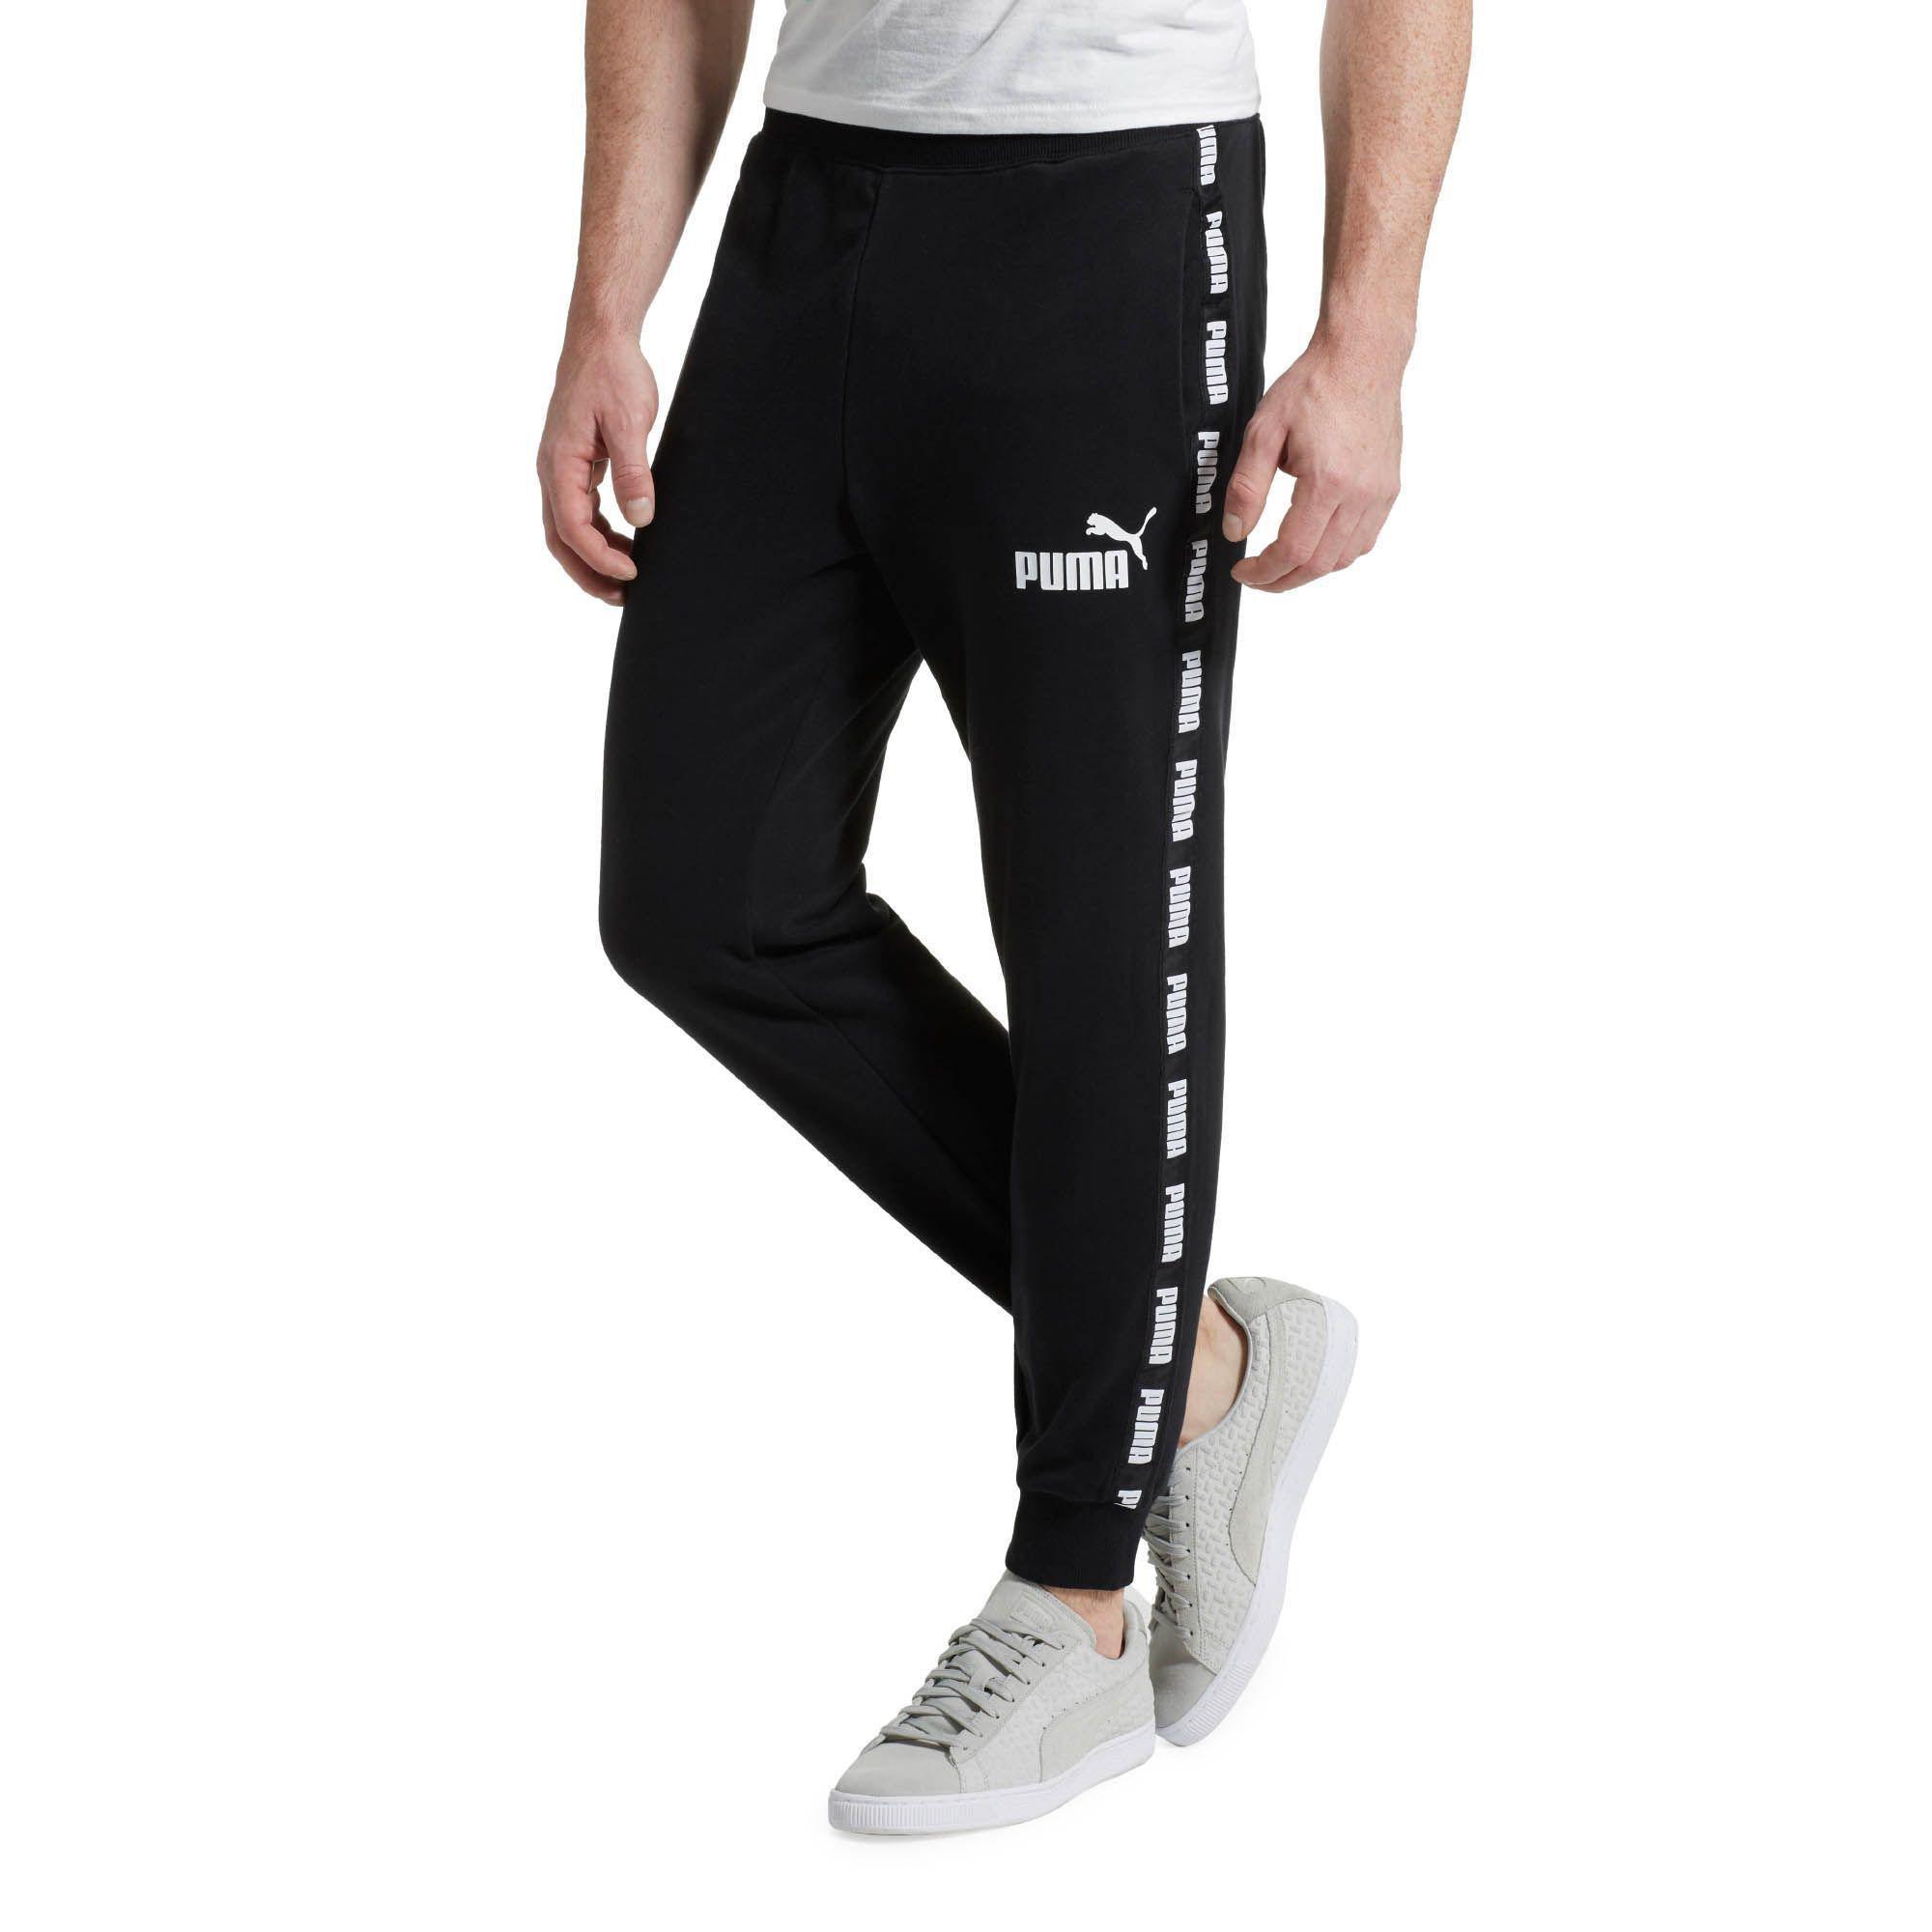 a921b15292b5 Lyst - PUMA Power Rebel Sweat Pants in Black for Men